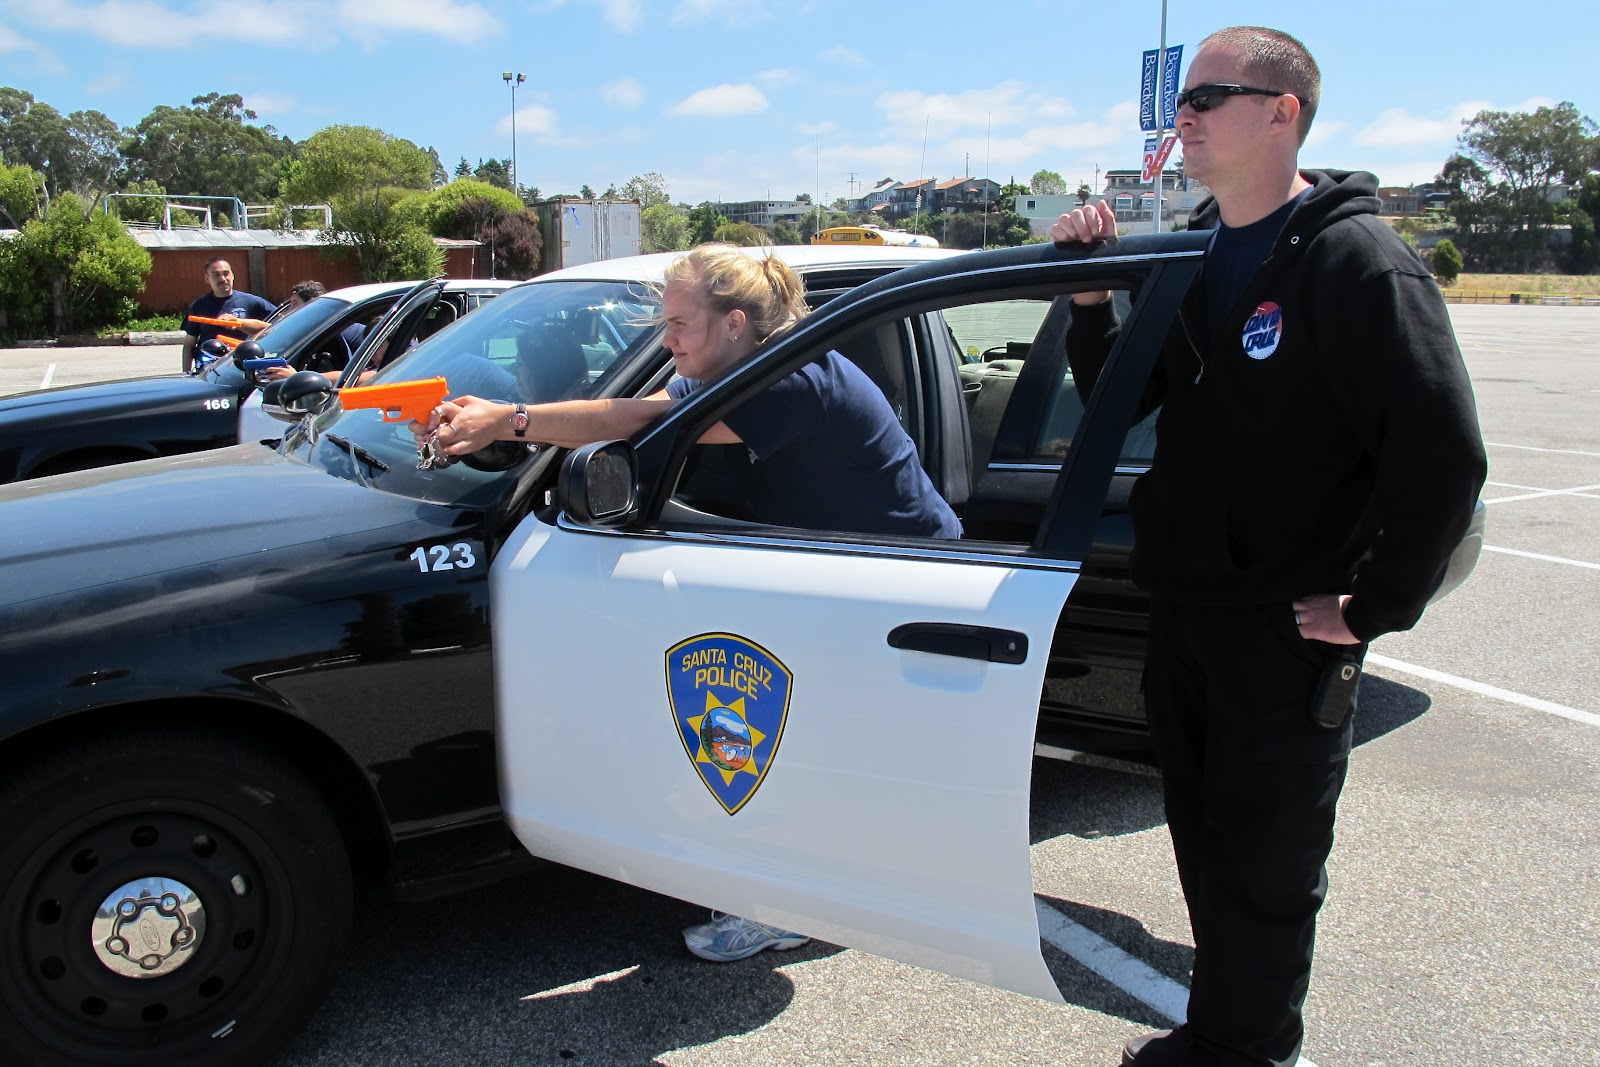 Santa Cruz Police Photos From Last Day Of Teen Public